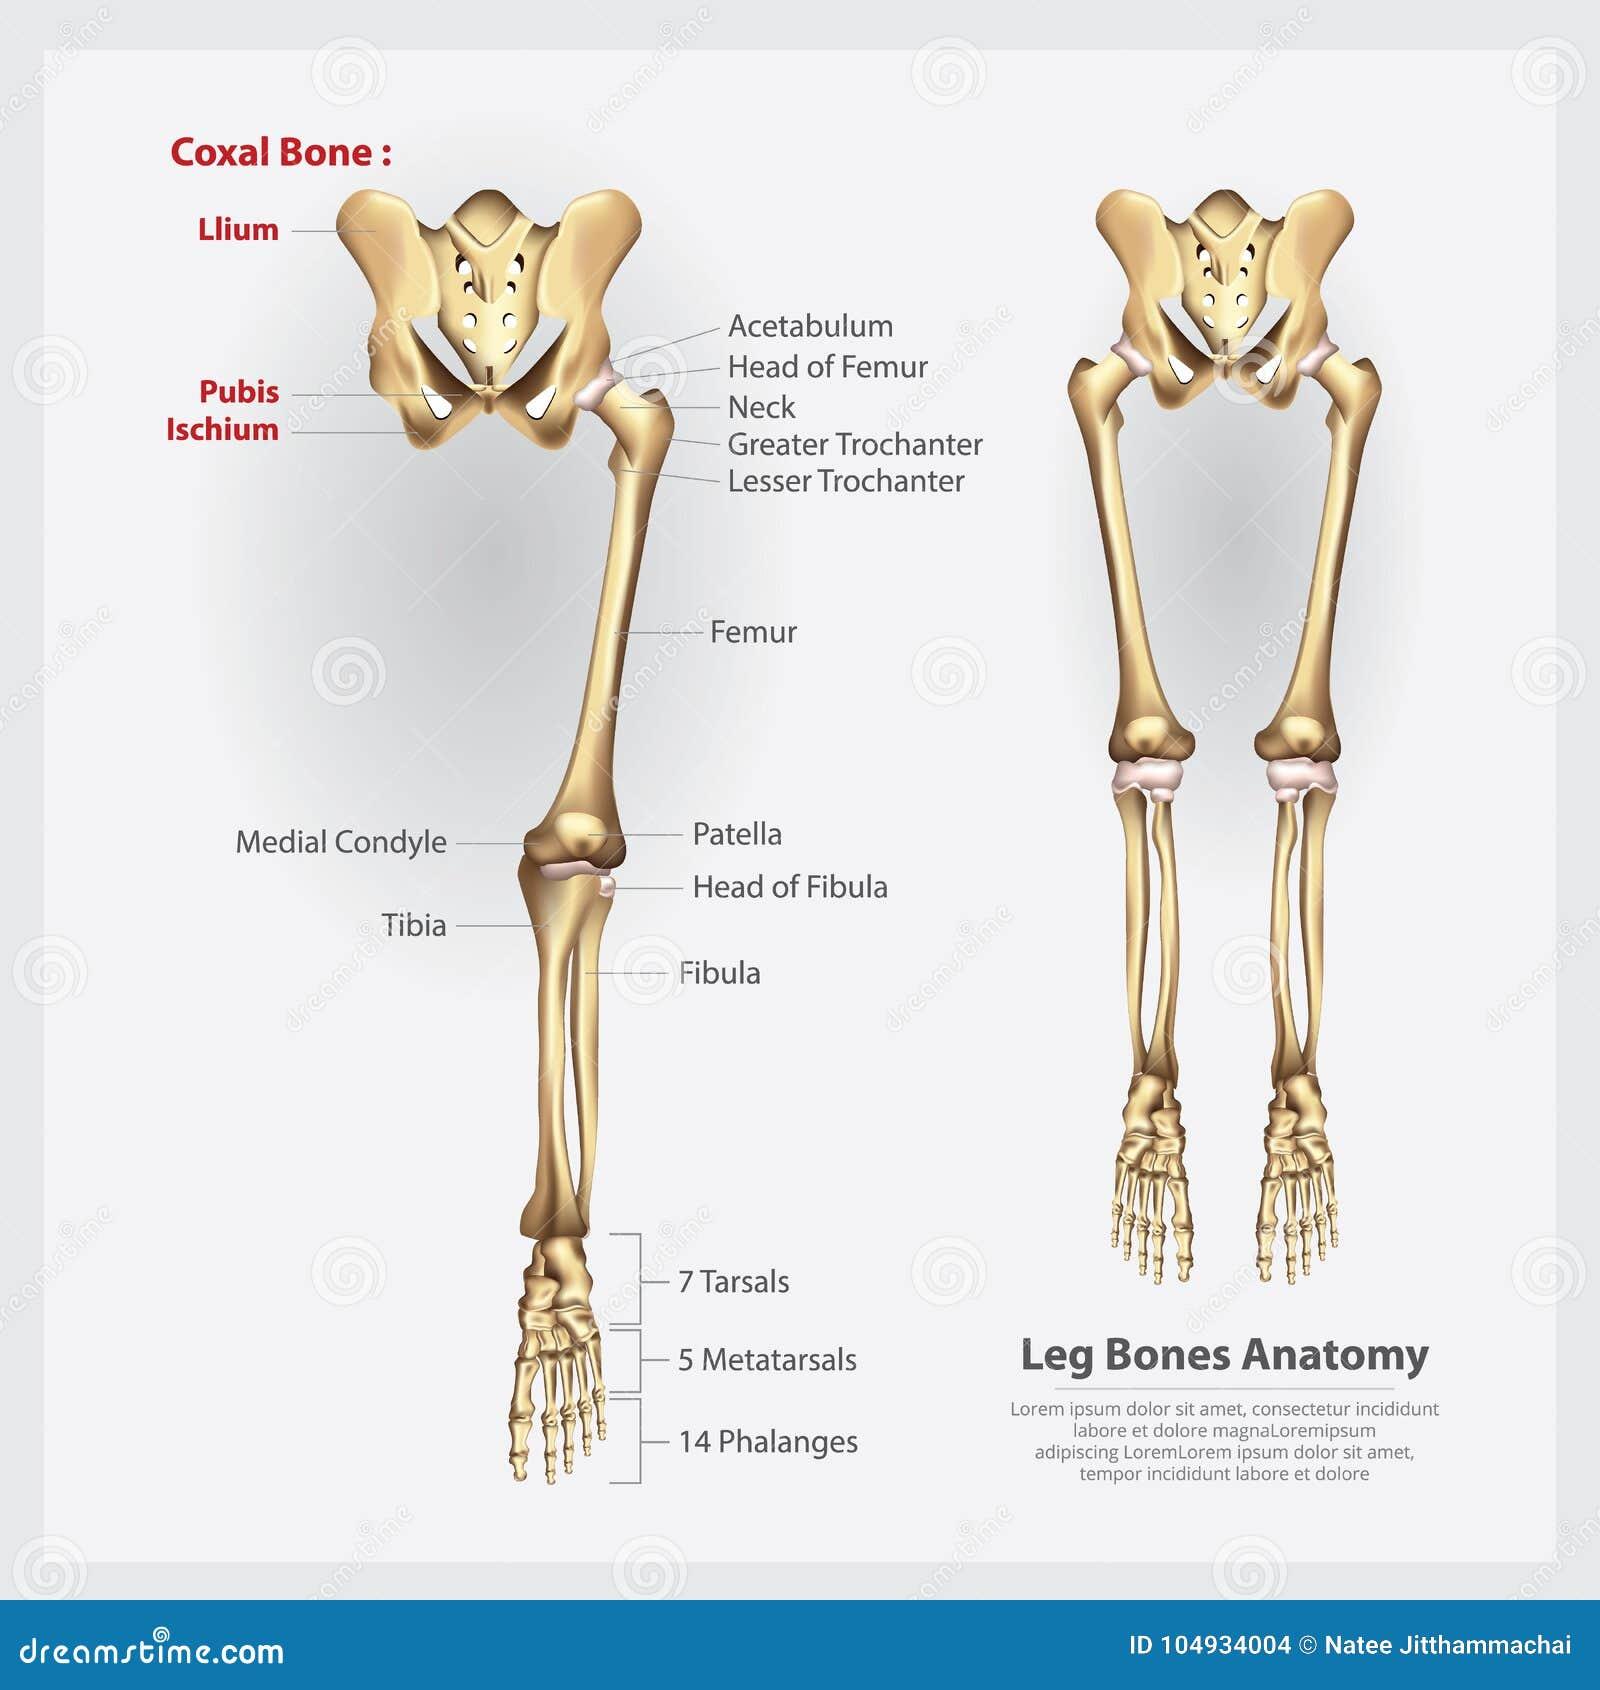 human anatomy leg bones stock vector illustration of flex. Black Bedroom Furniture Sets. Home Design Ideas